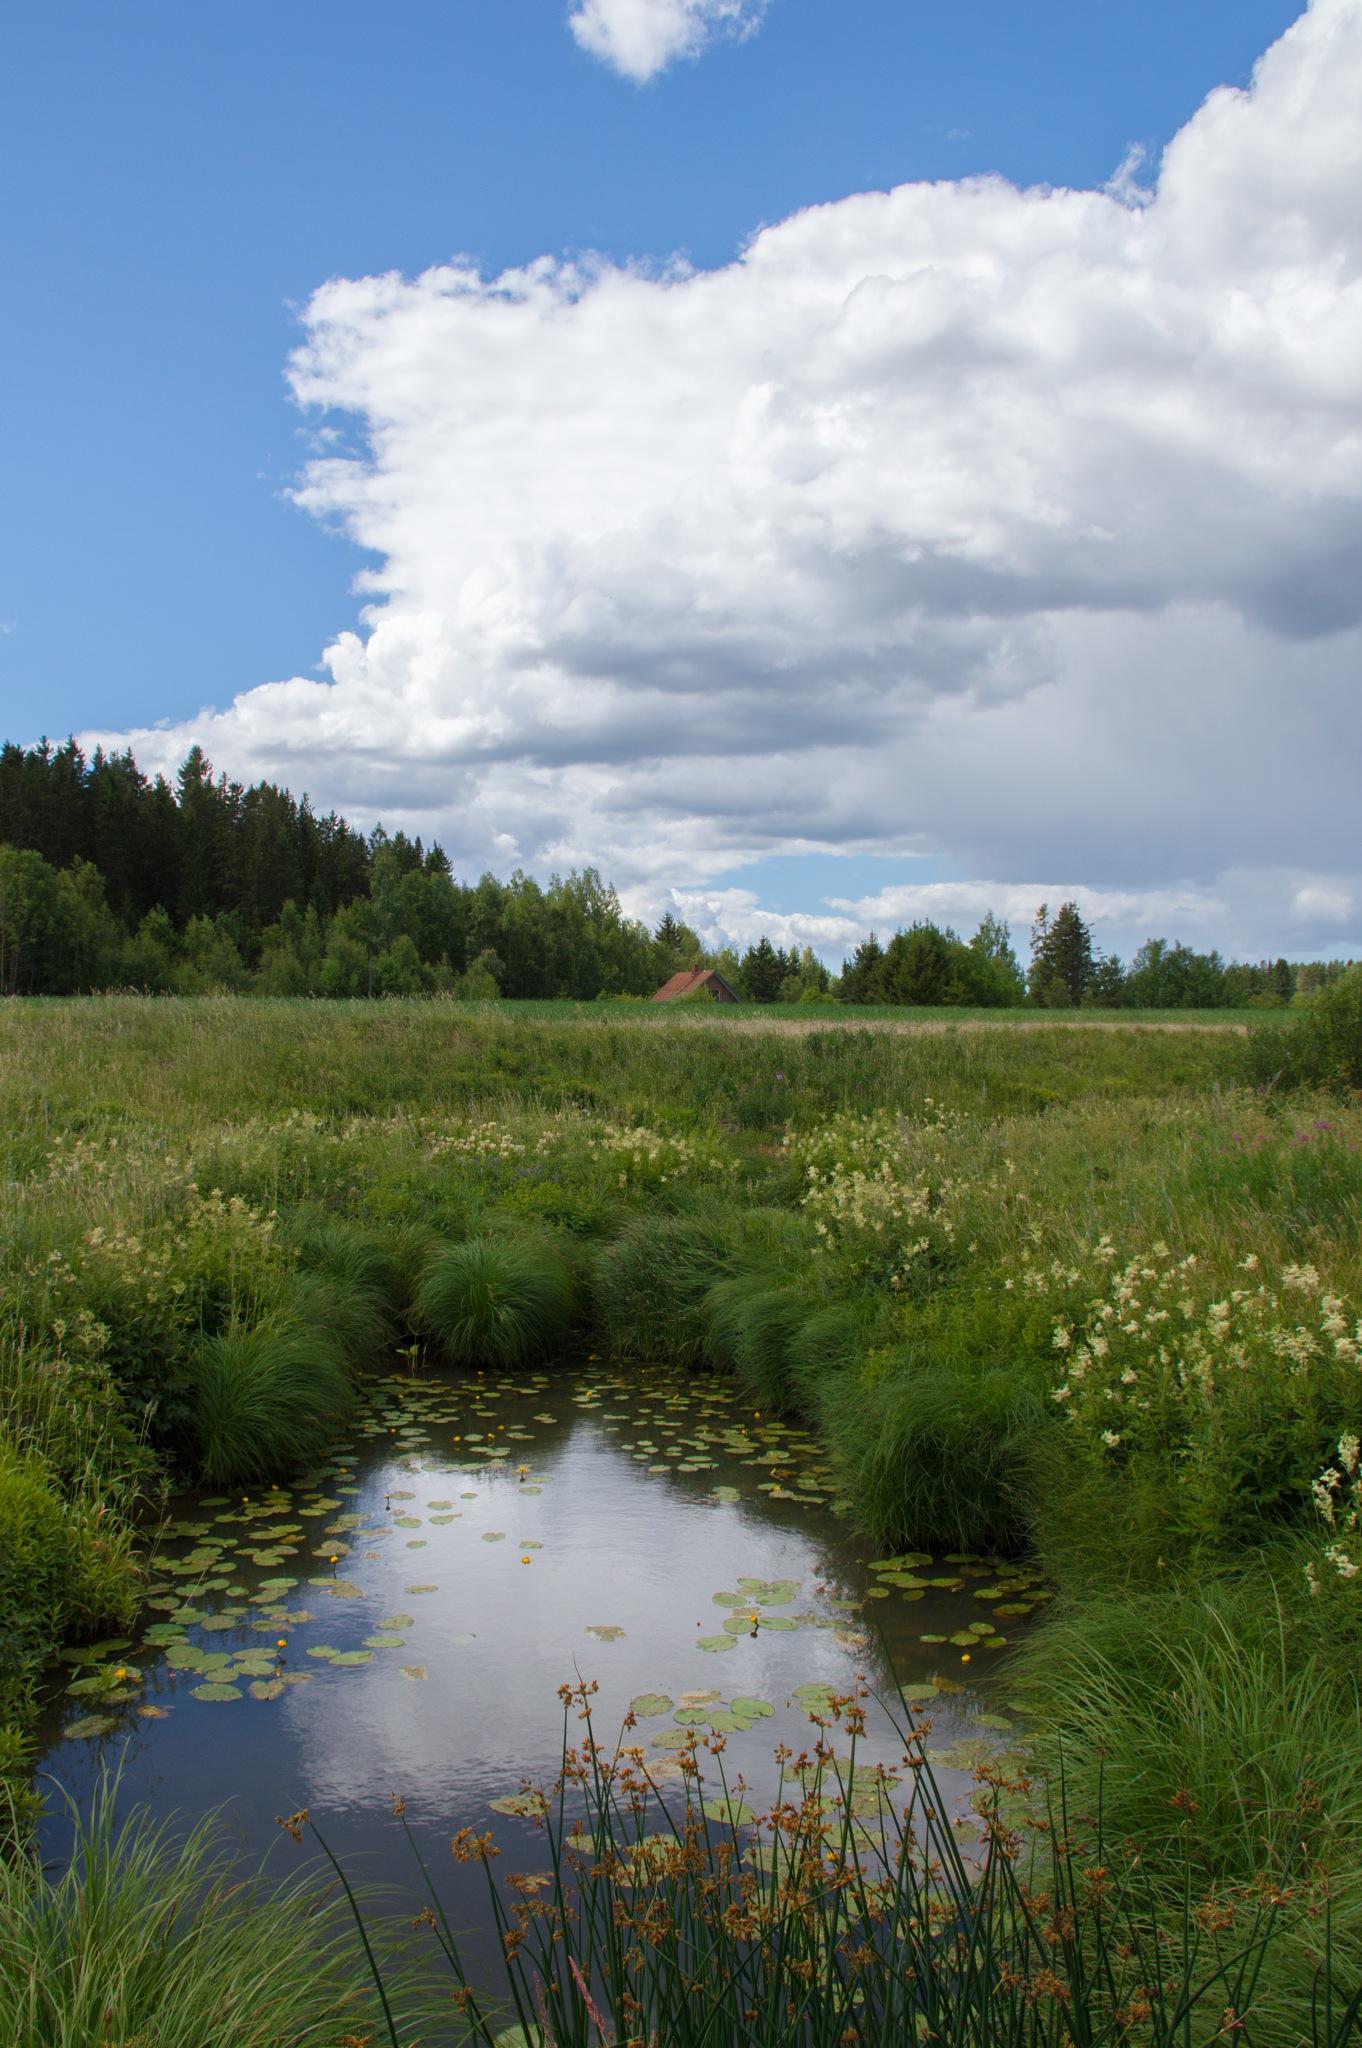 Countryside beauty by Viivi Kohonen